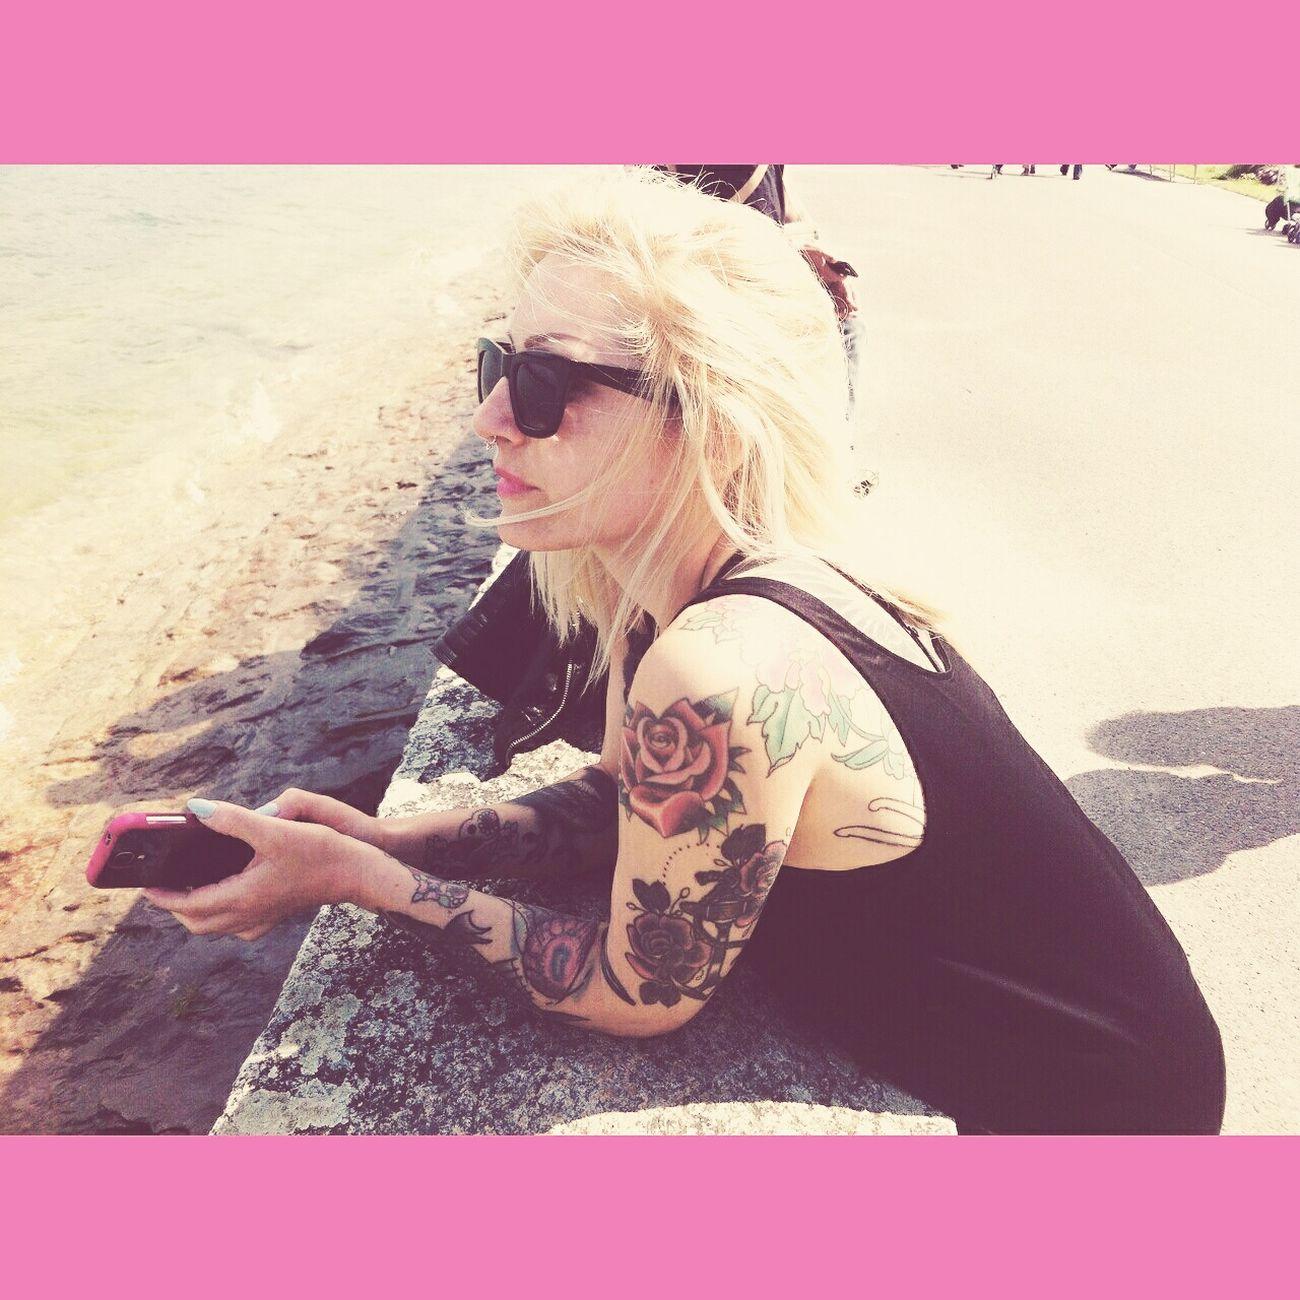 Parc de la Perle du Lac Relaxing Lacleman Tattoos Tattoocollector INKEDGIRL Strolling Cherrypopy Blondiegirl Quaigustaveador